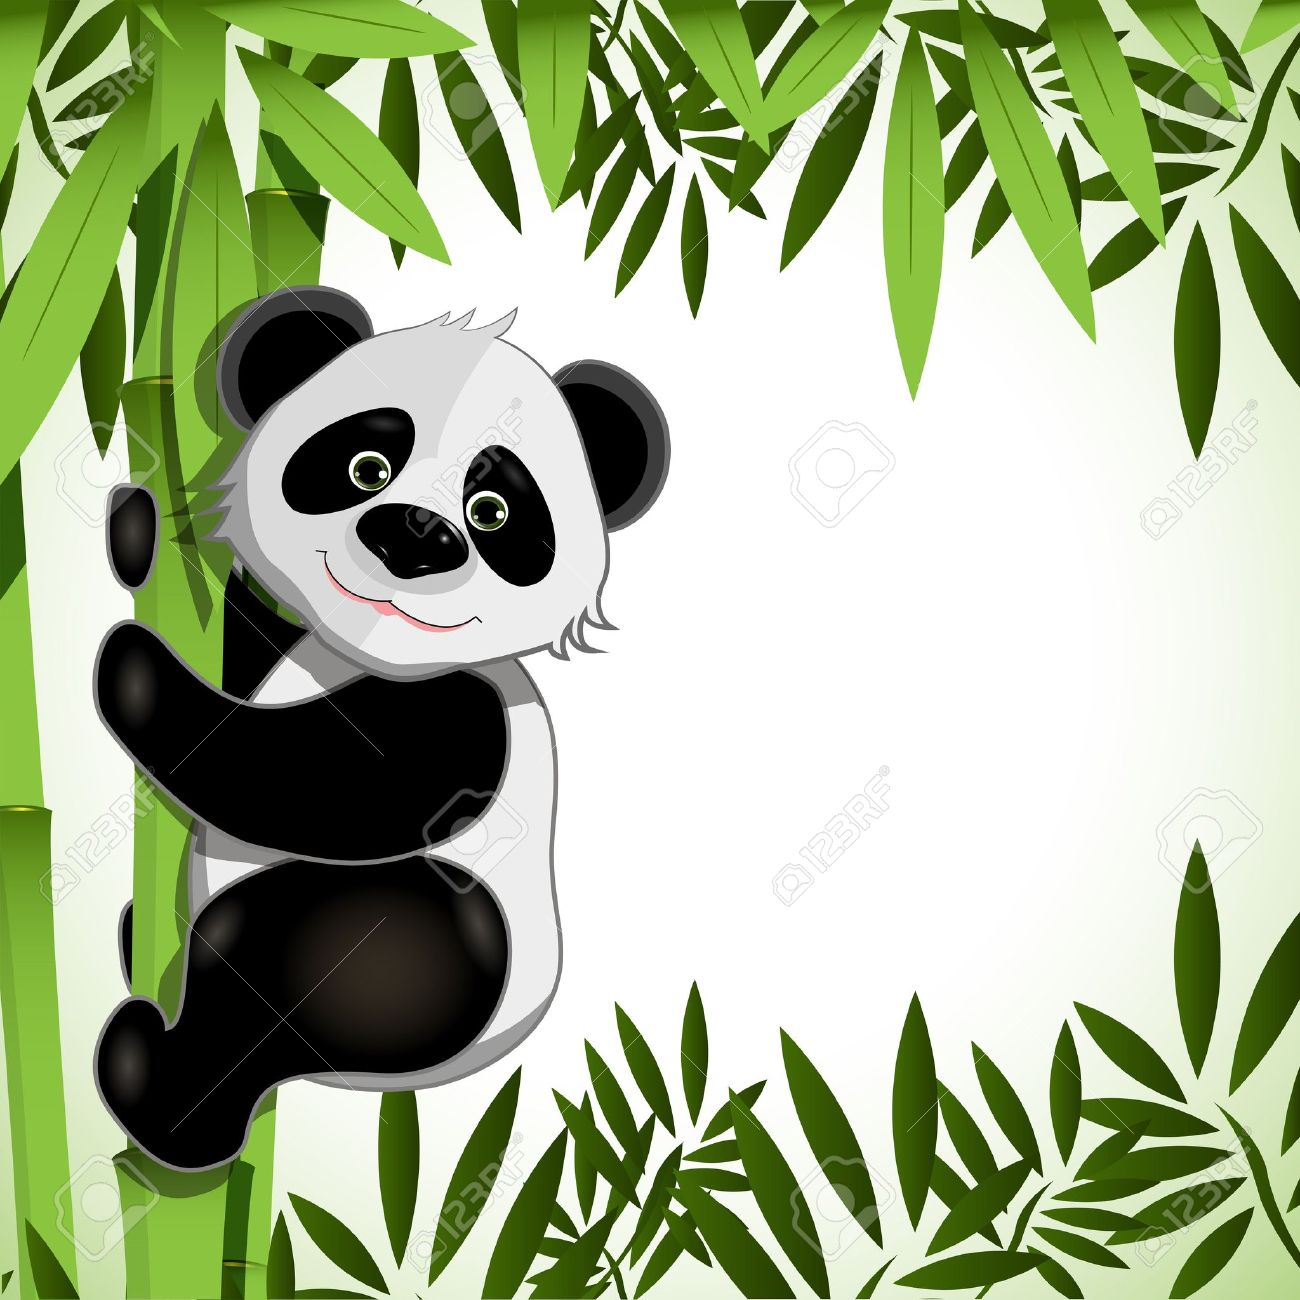 And . Bamboo clipart panda